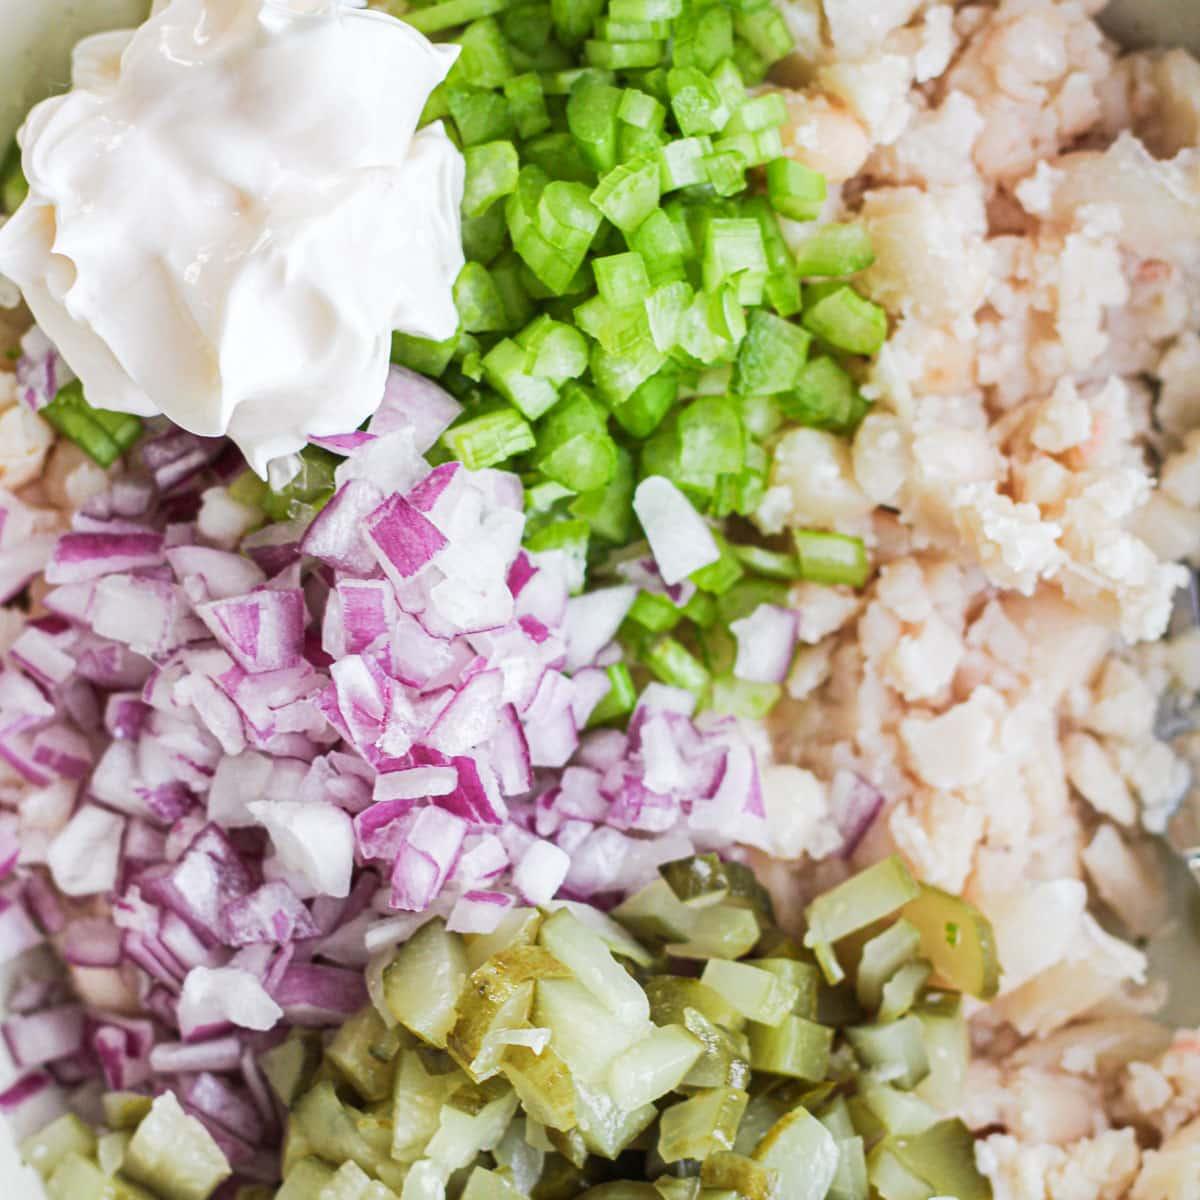 vegan tuna melt ingredients in a bowl